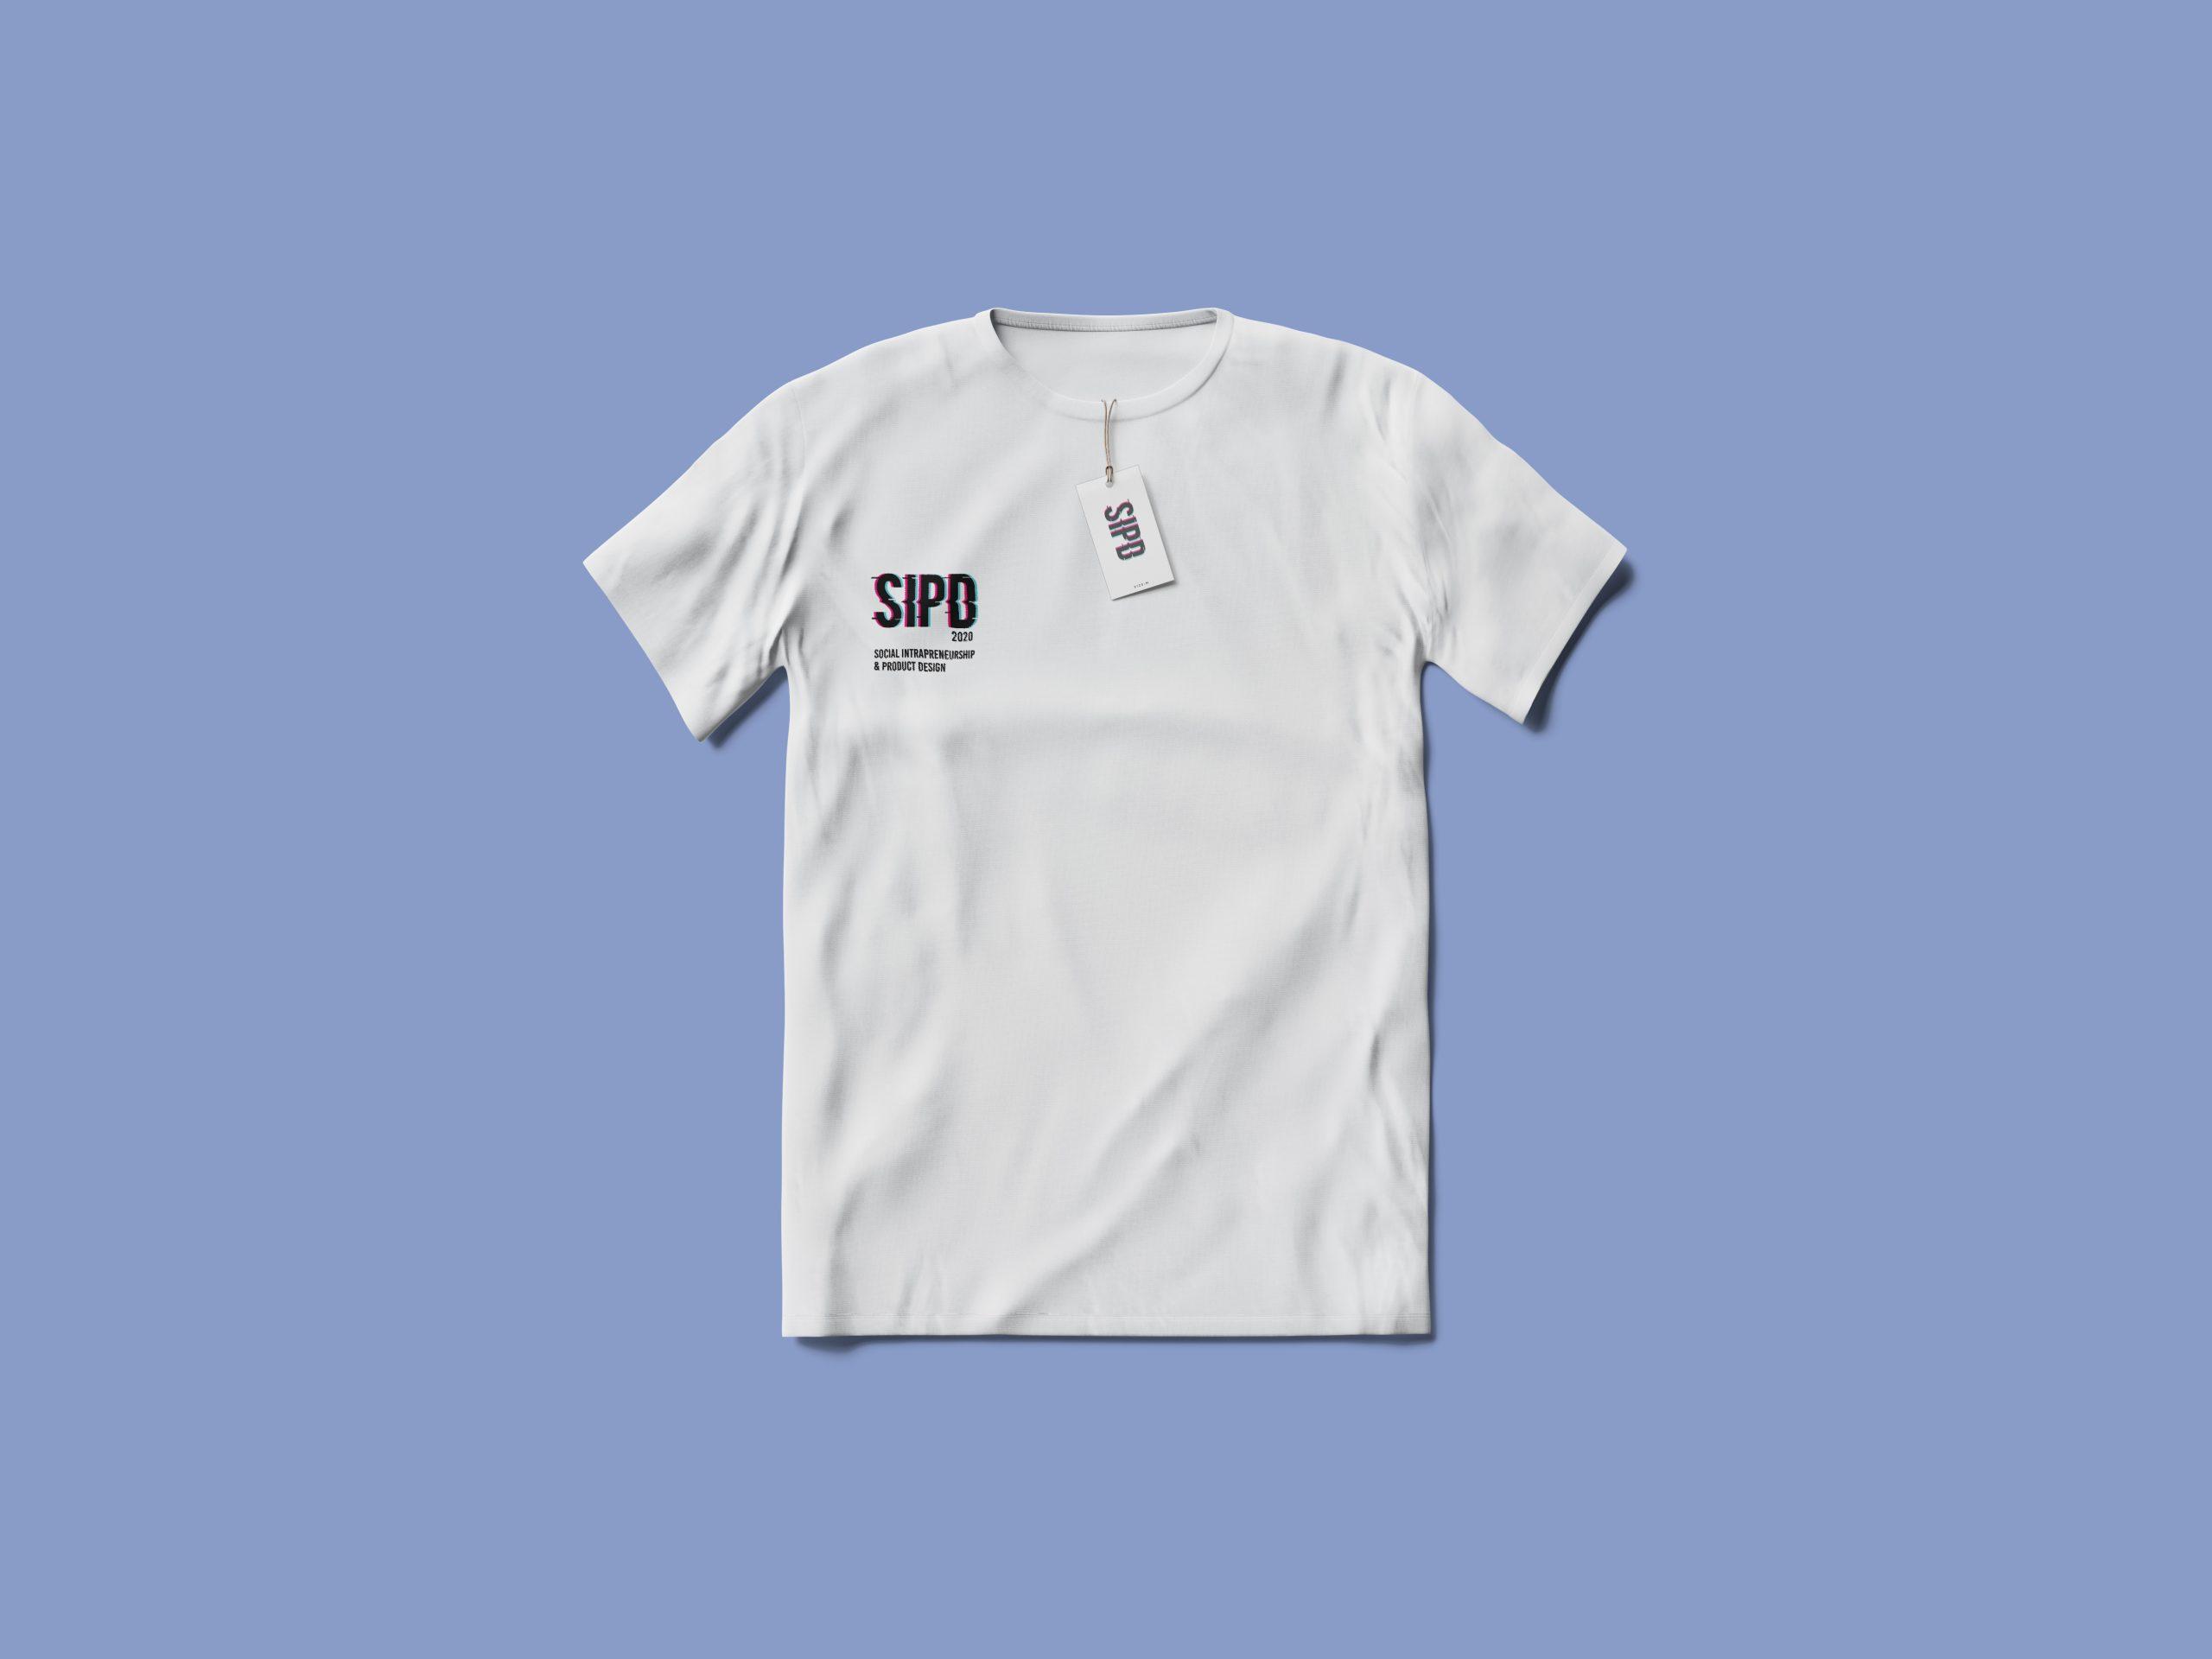 Shirt mockup with logo